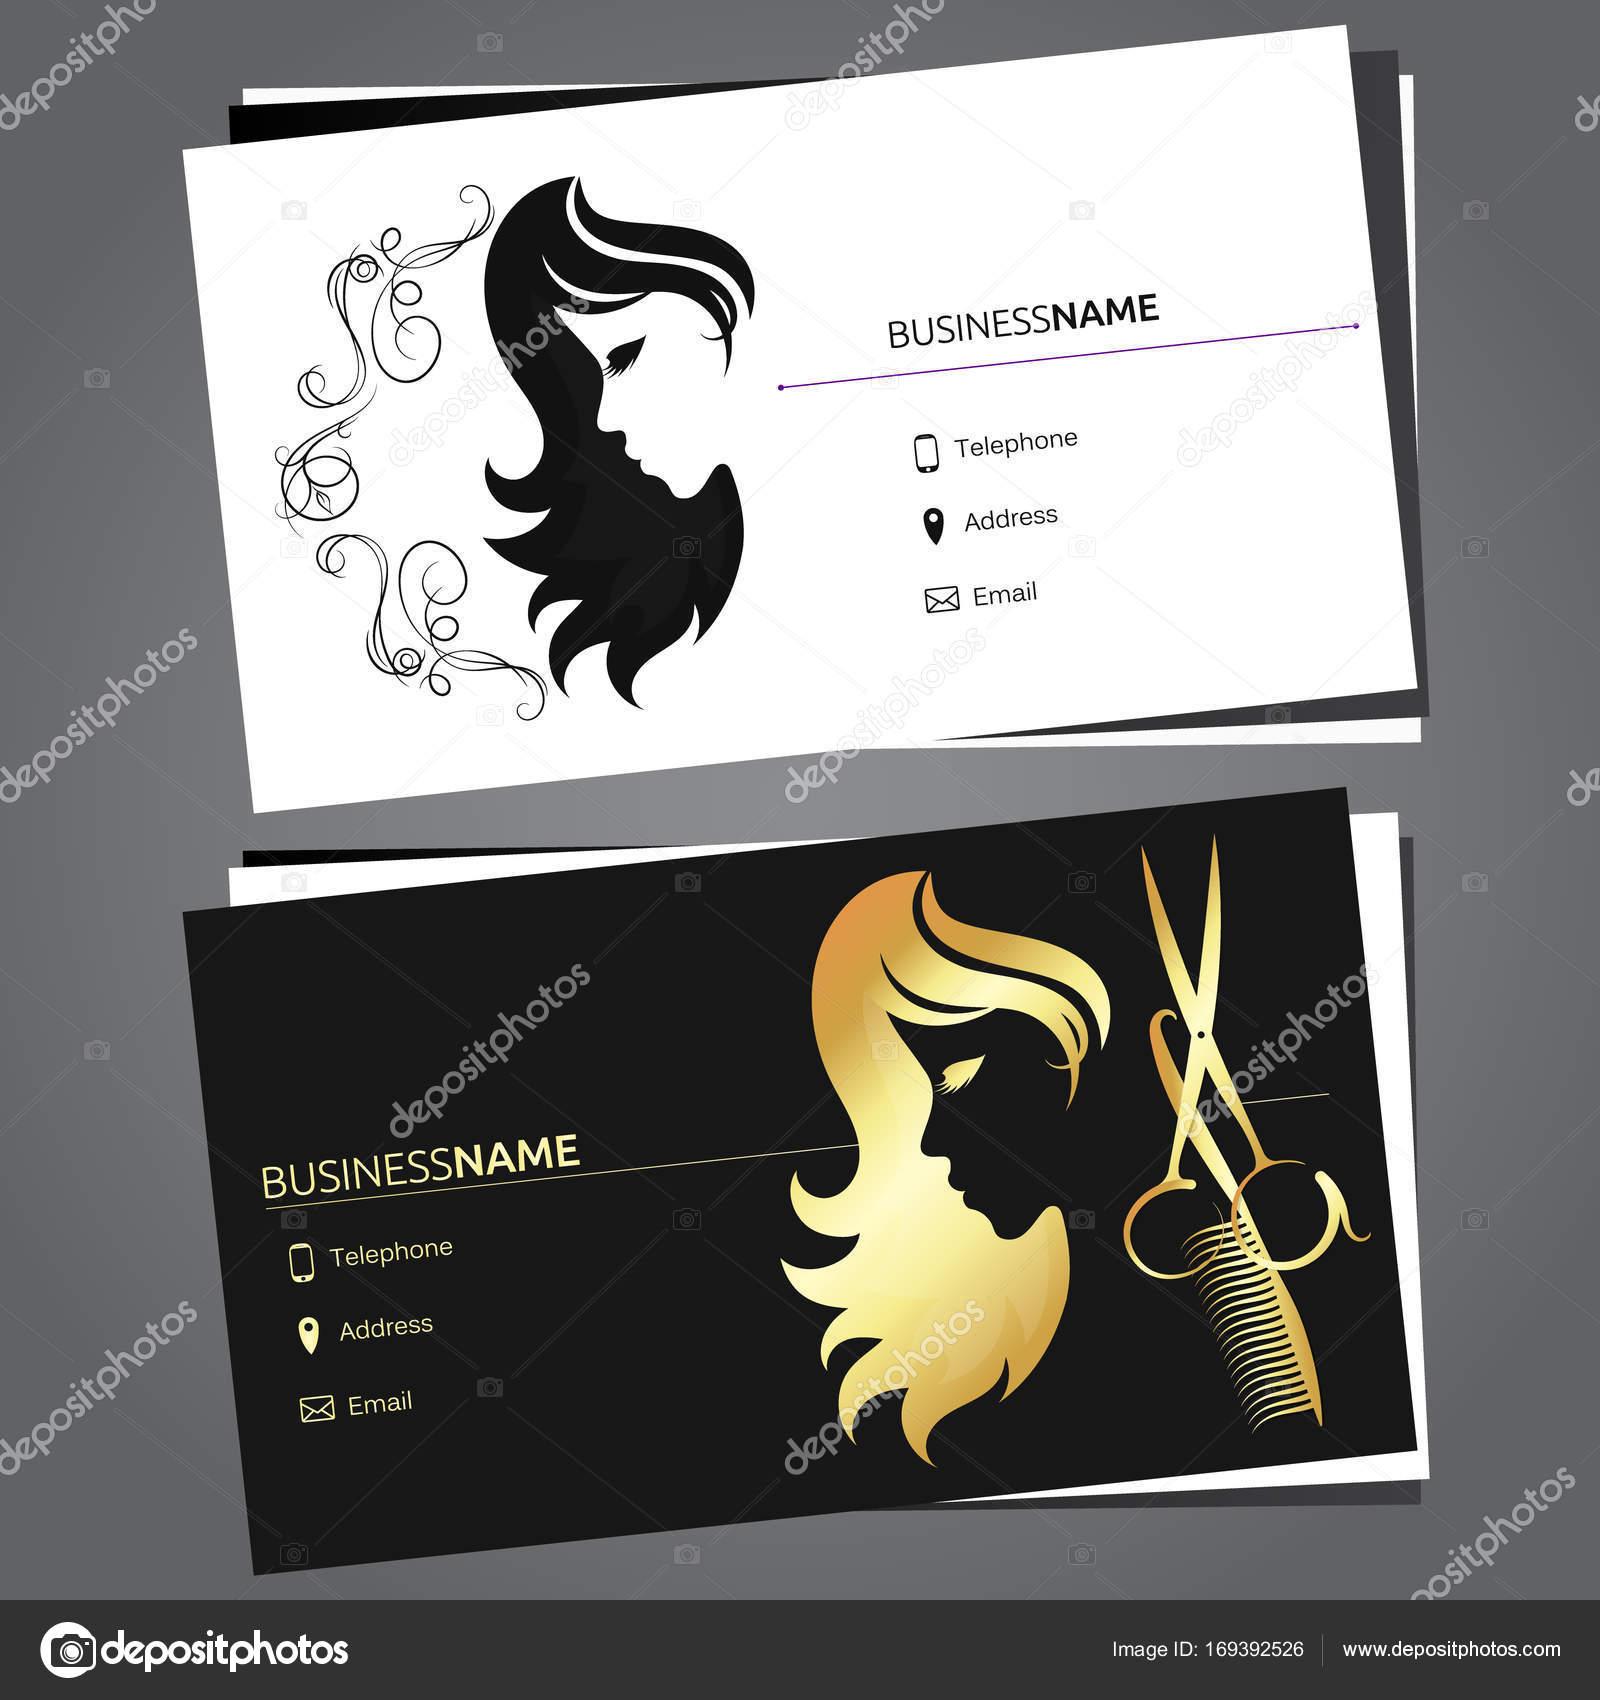 Business card for beauty salon stock vector john1279 169392526 business card for beauty salon and hairdresser vector by john1279 colourmoves